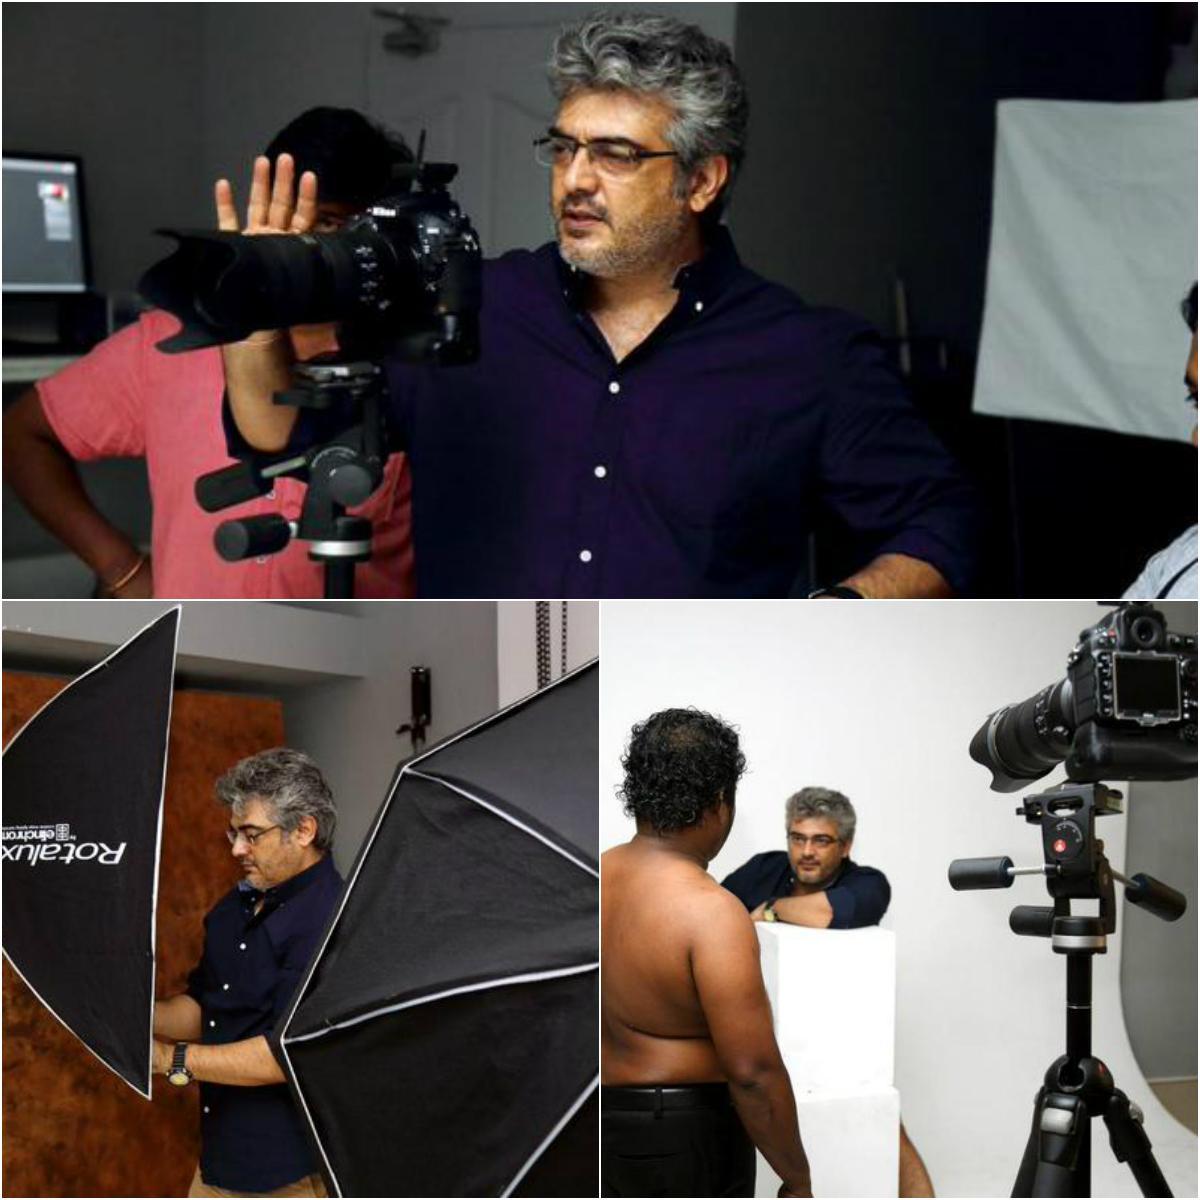 #AjithKumarPhotography அப்புக்குட்டியை போட்டோ ஷூட் எடுத்த அஜித்தின் வொர்க்கிங் ஸ்டில்ஸ்! http://t.co/JyI0e0kBPB http://t.co/r8fMGBgDTW